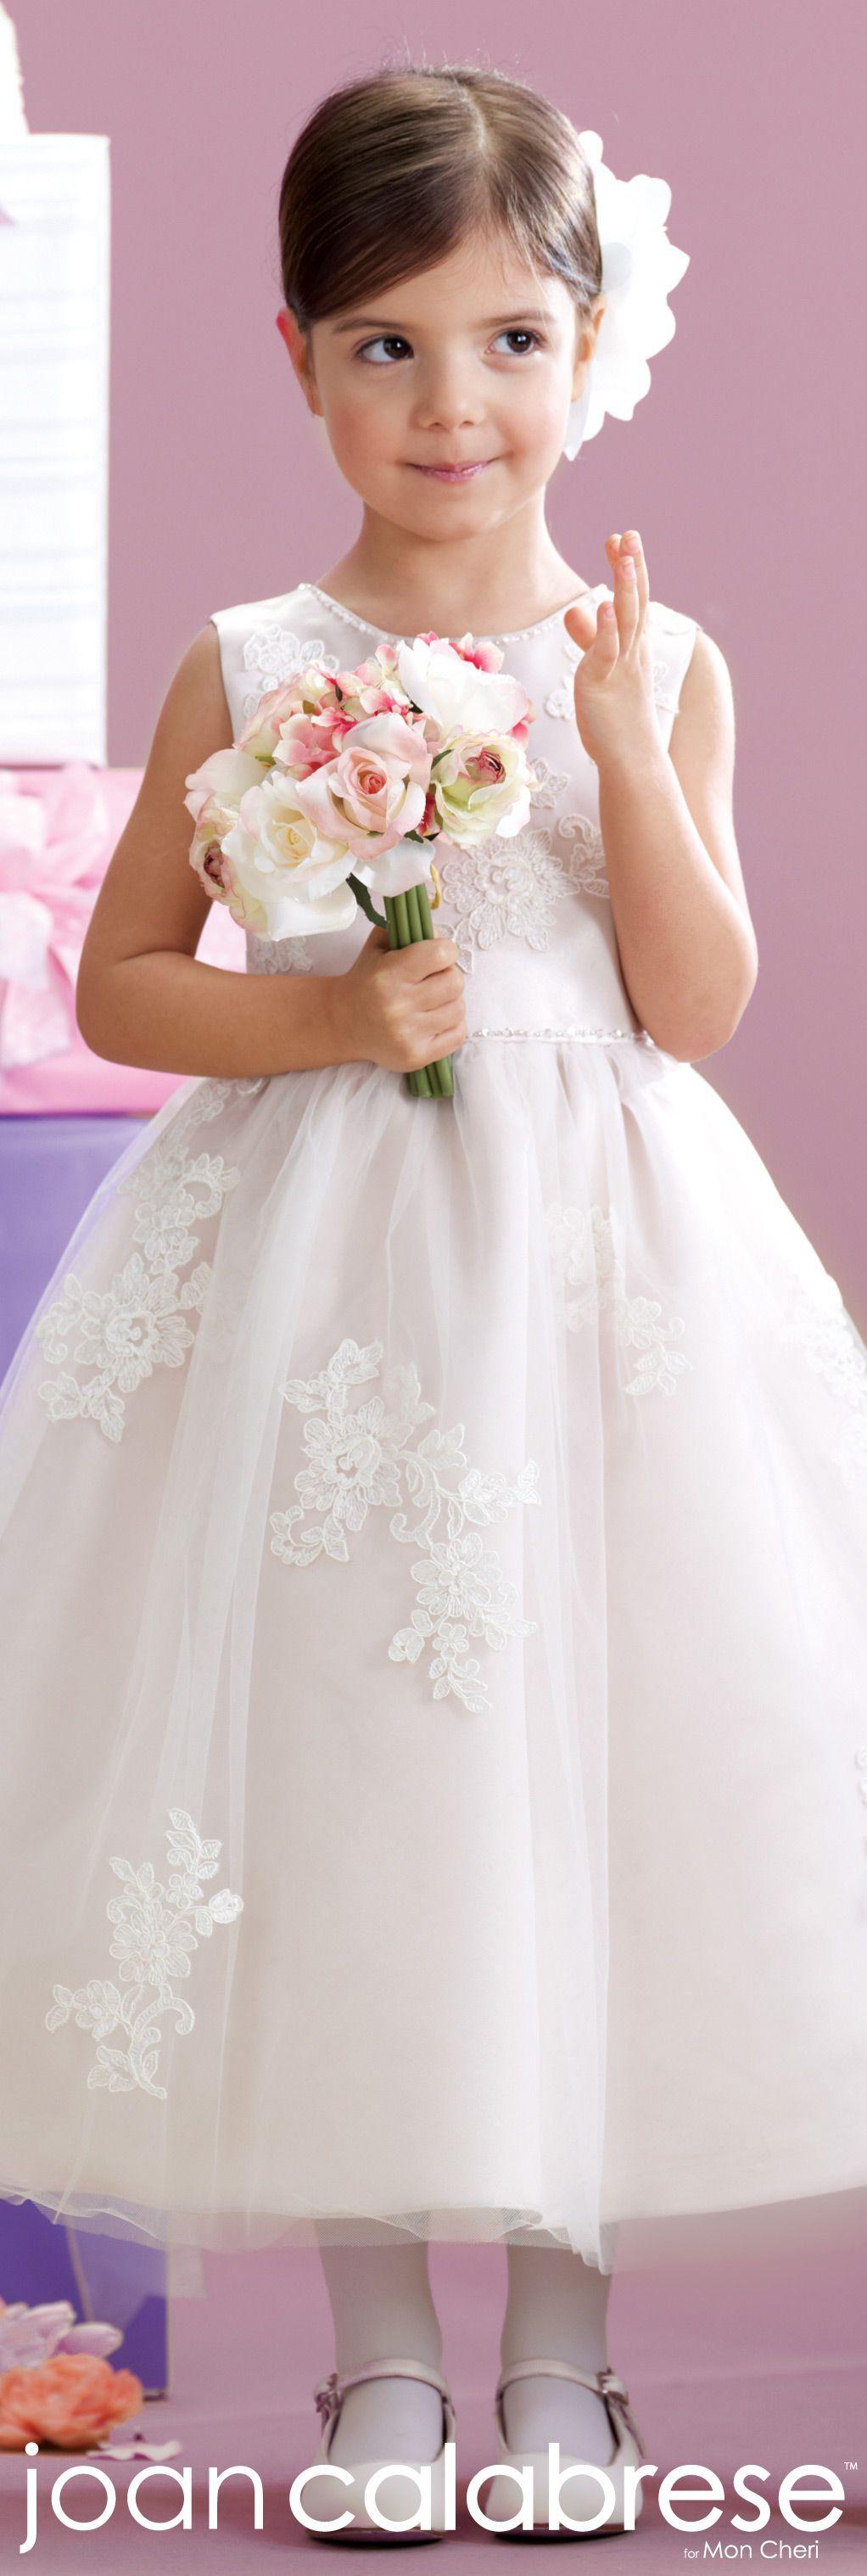 Joan calabrese flower girl dresses casamento sempre é lindo